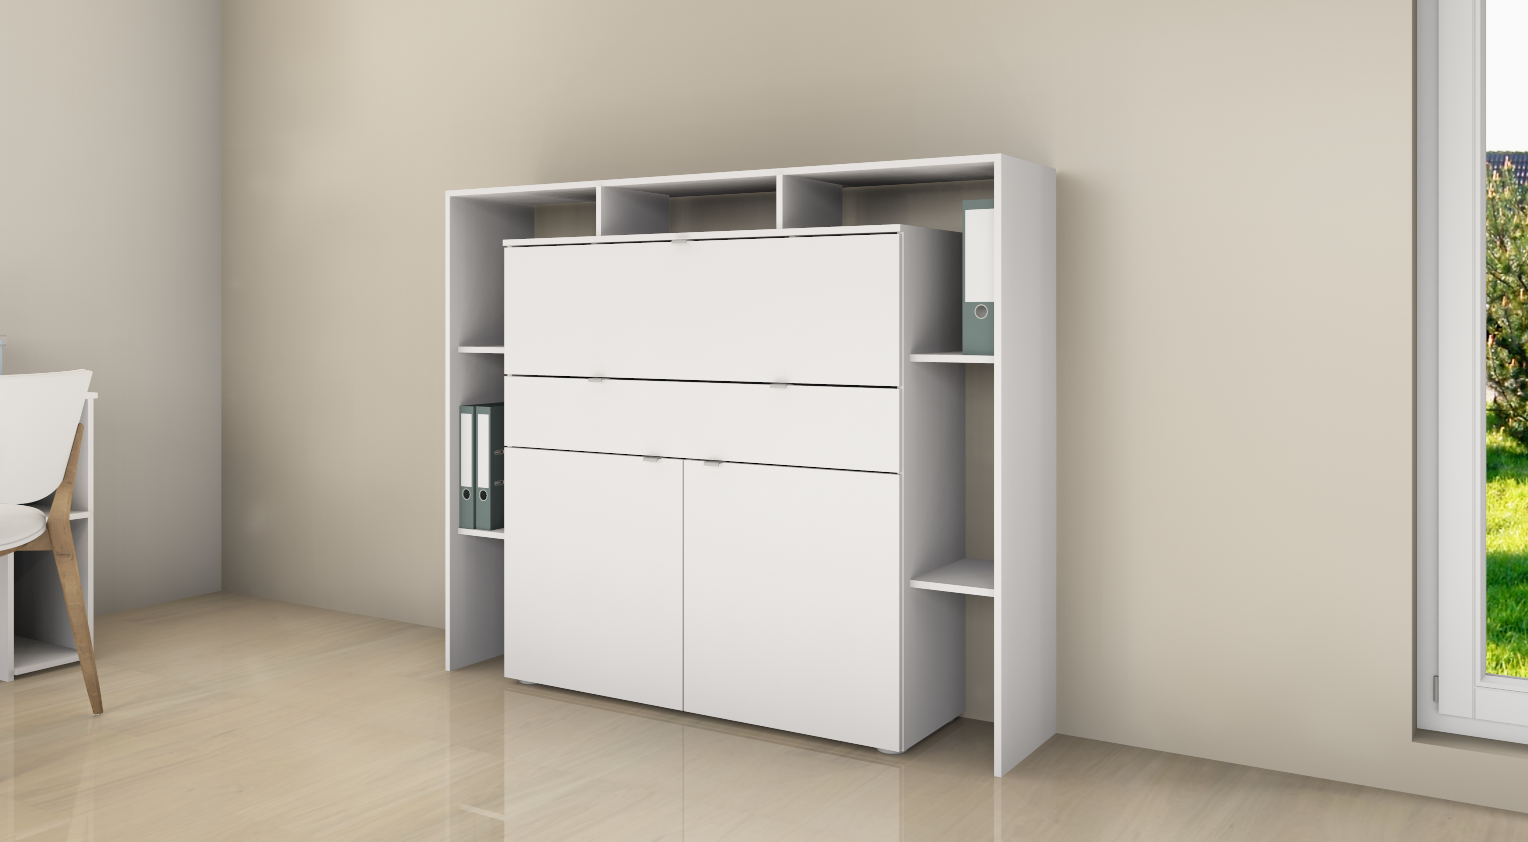 garderobenset rena schuhschrank garderobe paneel spiegel flur wandgarderobe ebay. Black Bedroom Furniture Sets. Home Design Ideas